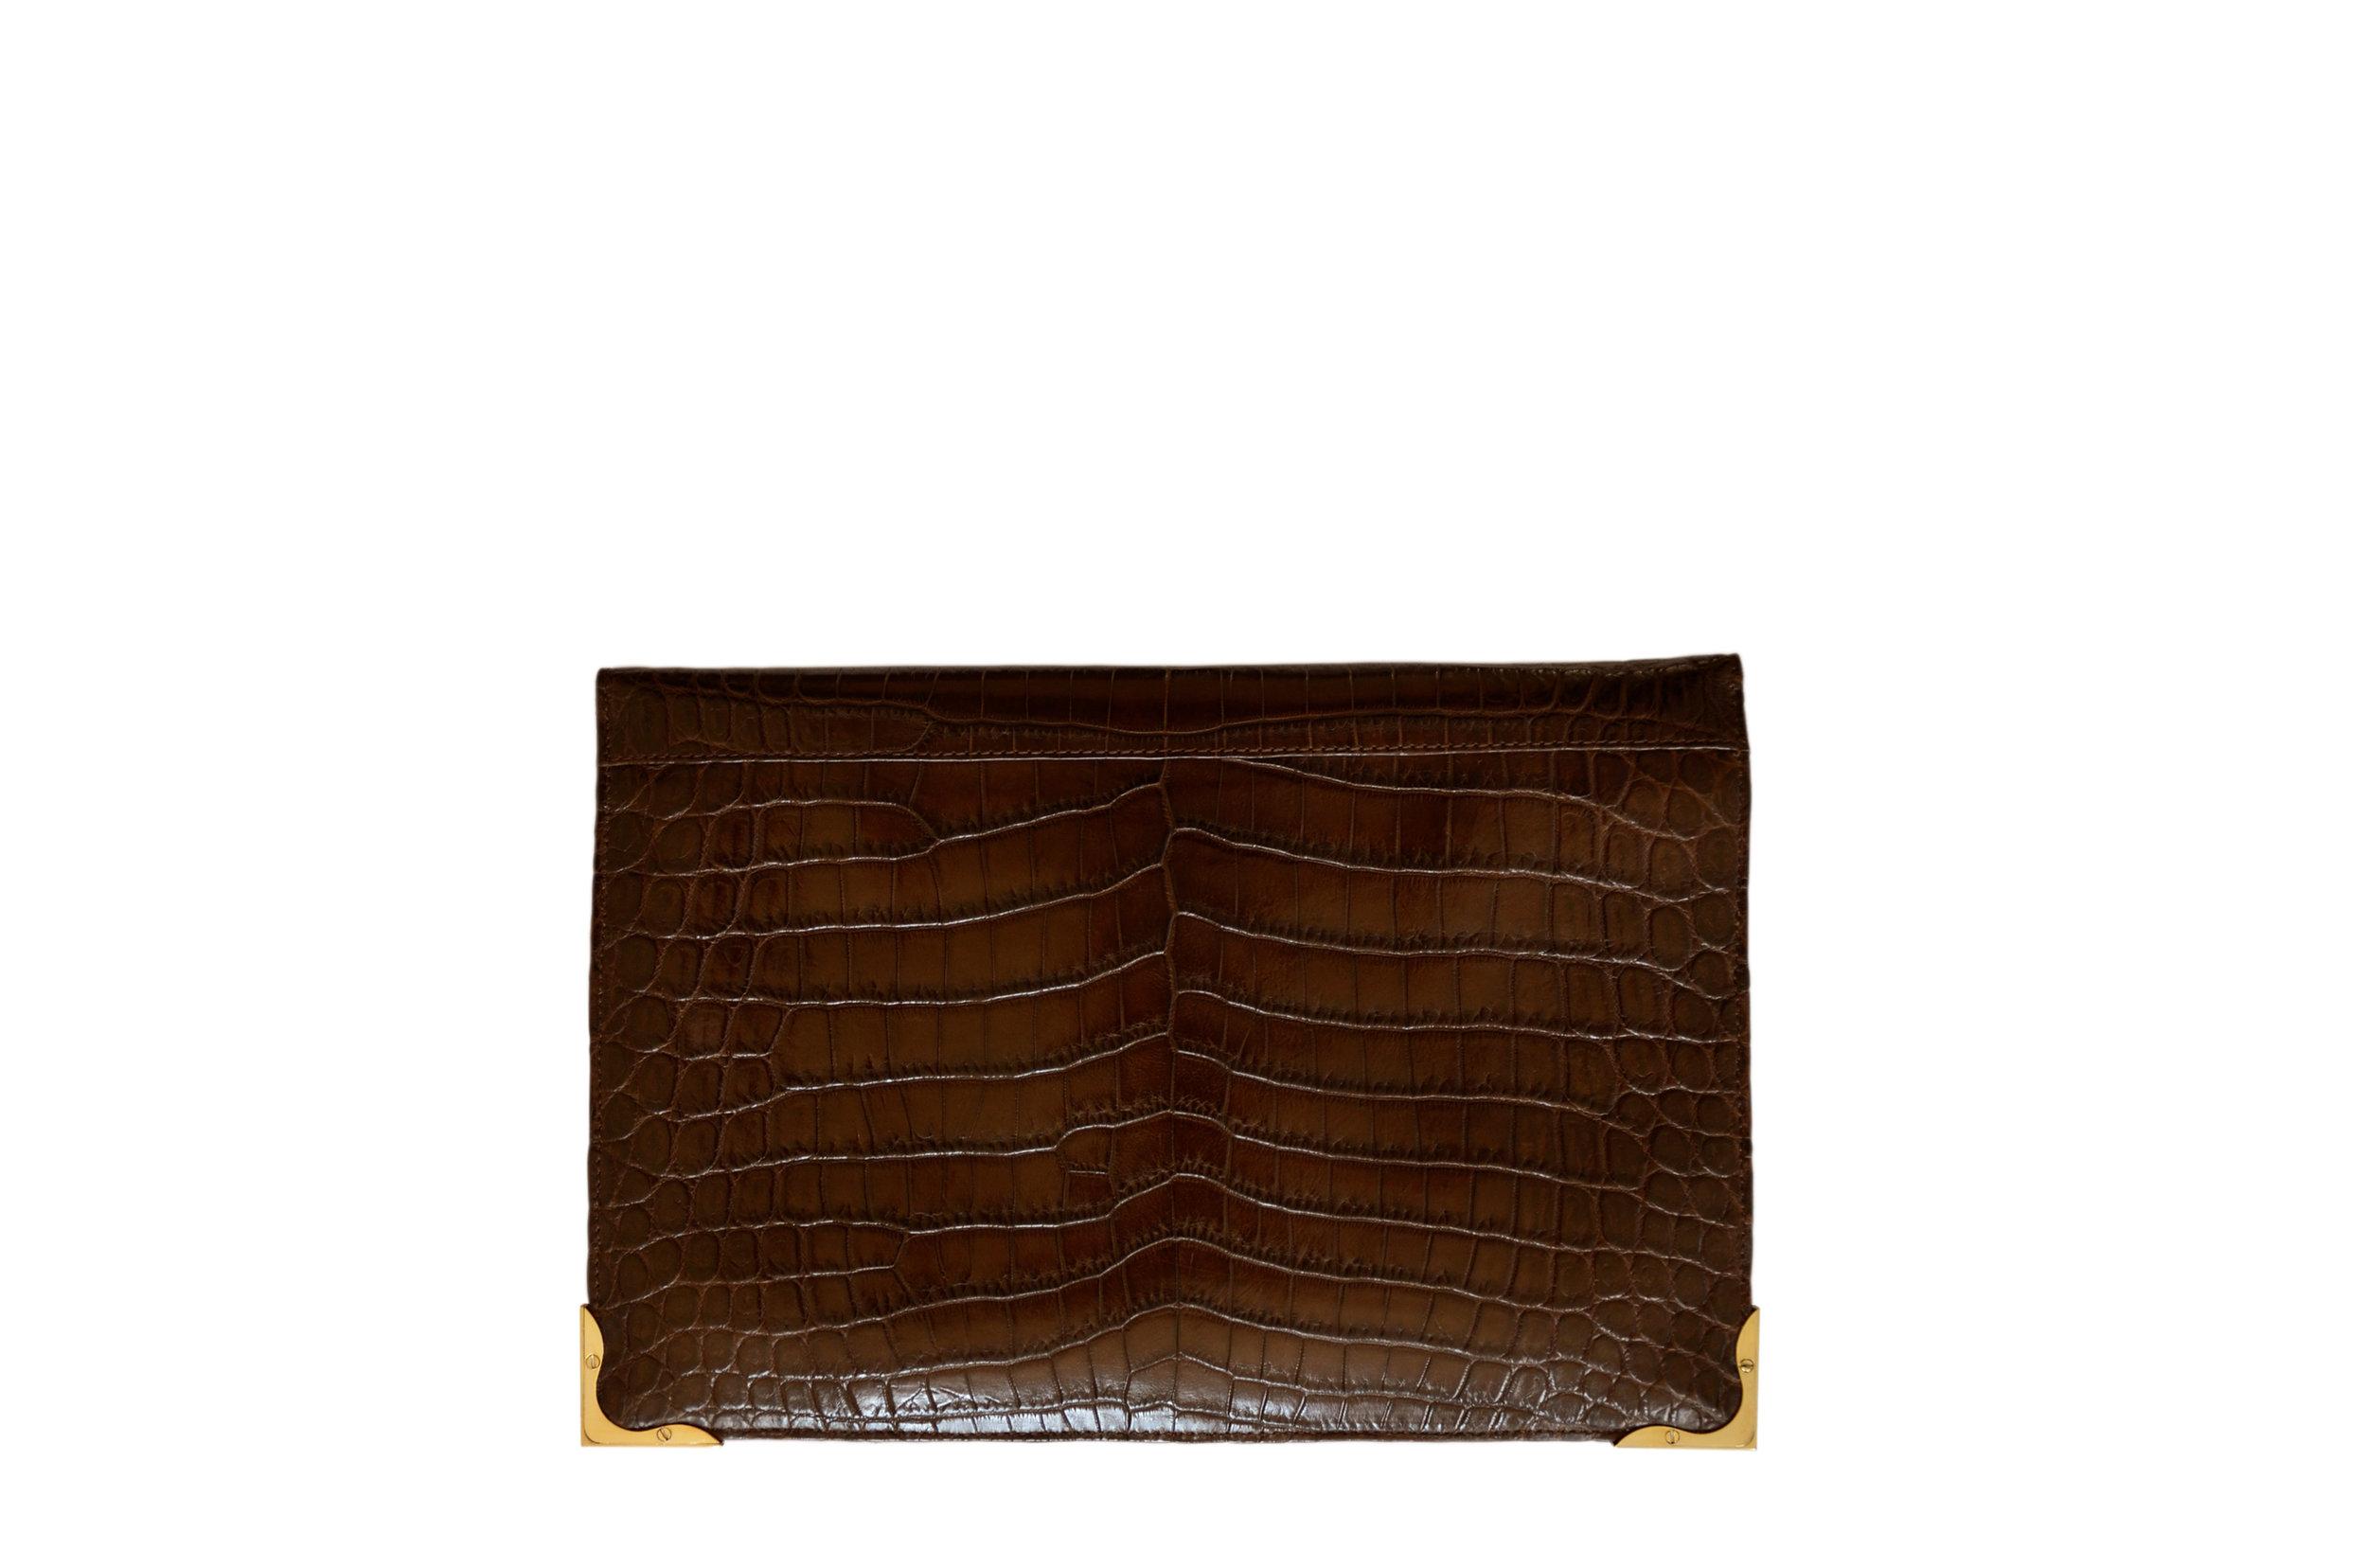 Luxury Brown Crocodile Clutch